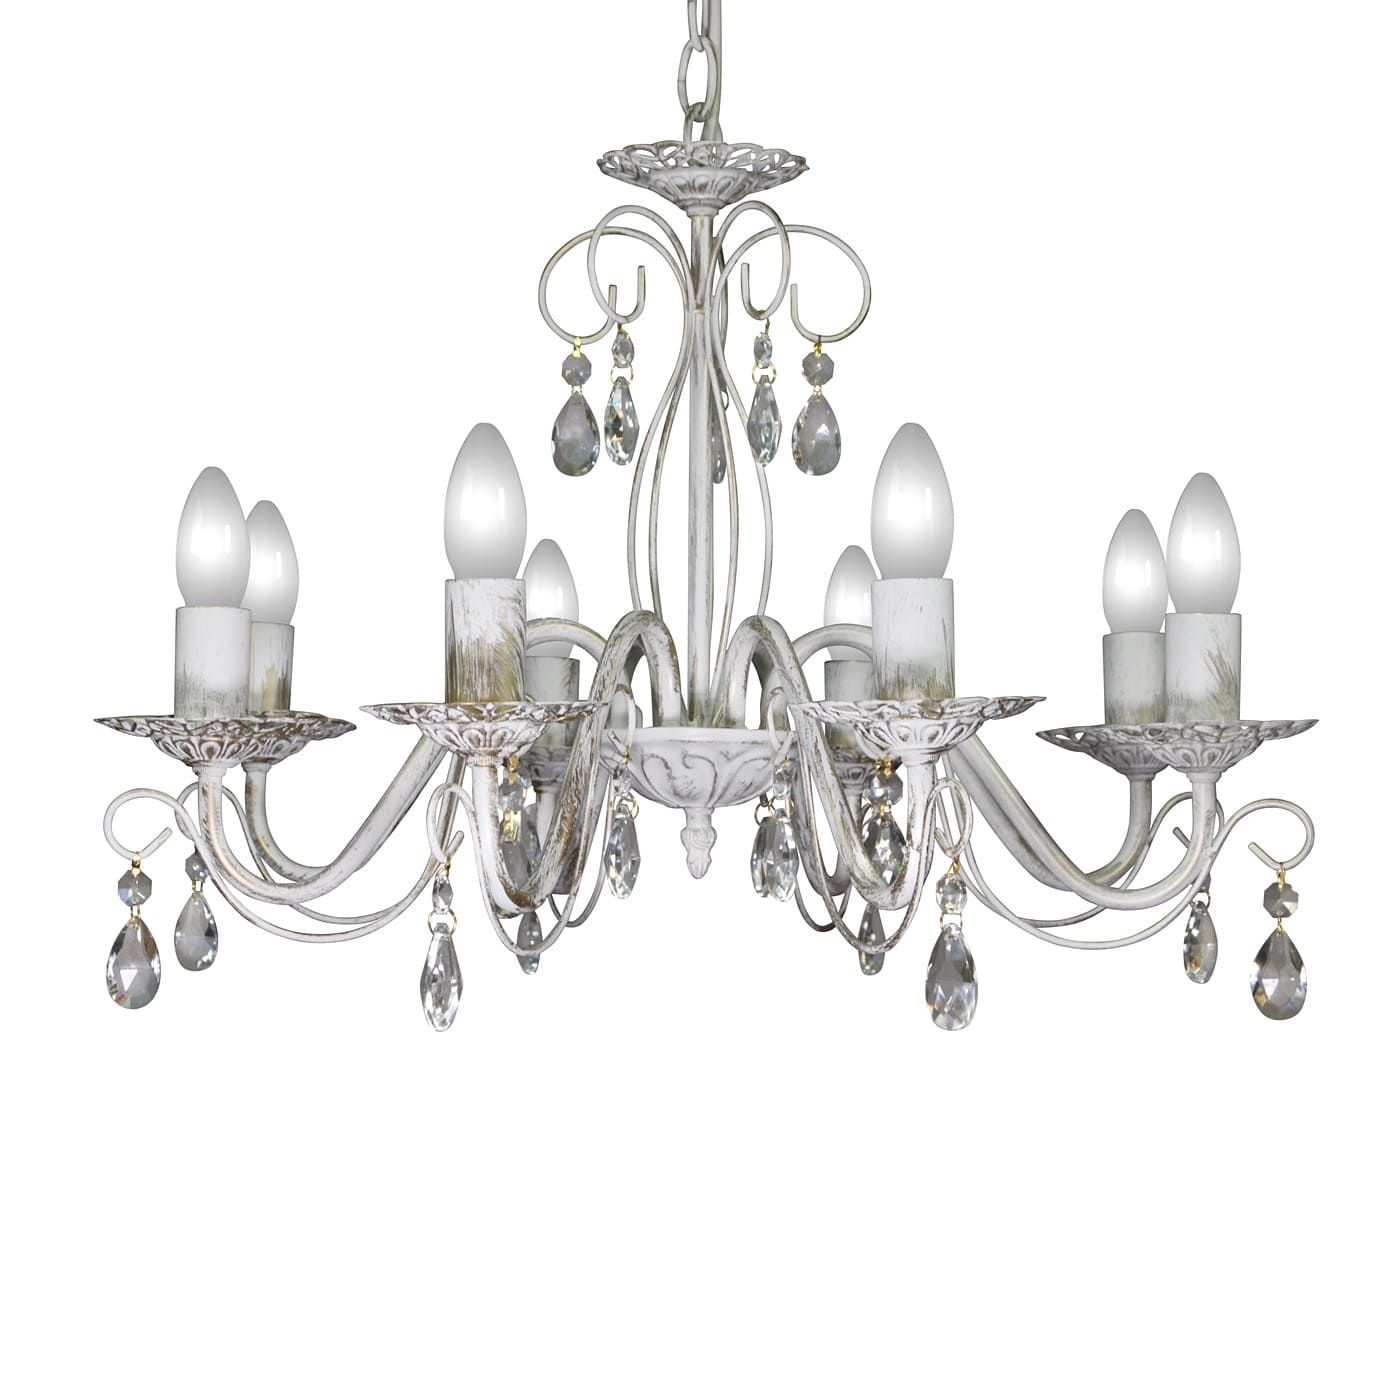 PETRASVET / Pendant chandelier S8066-8, 8xE14 max. 60W